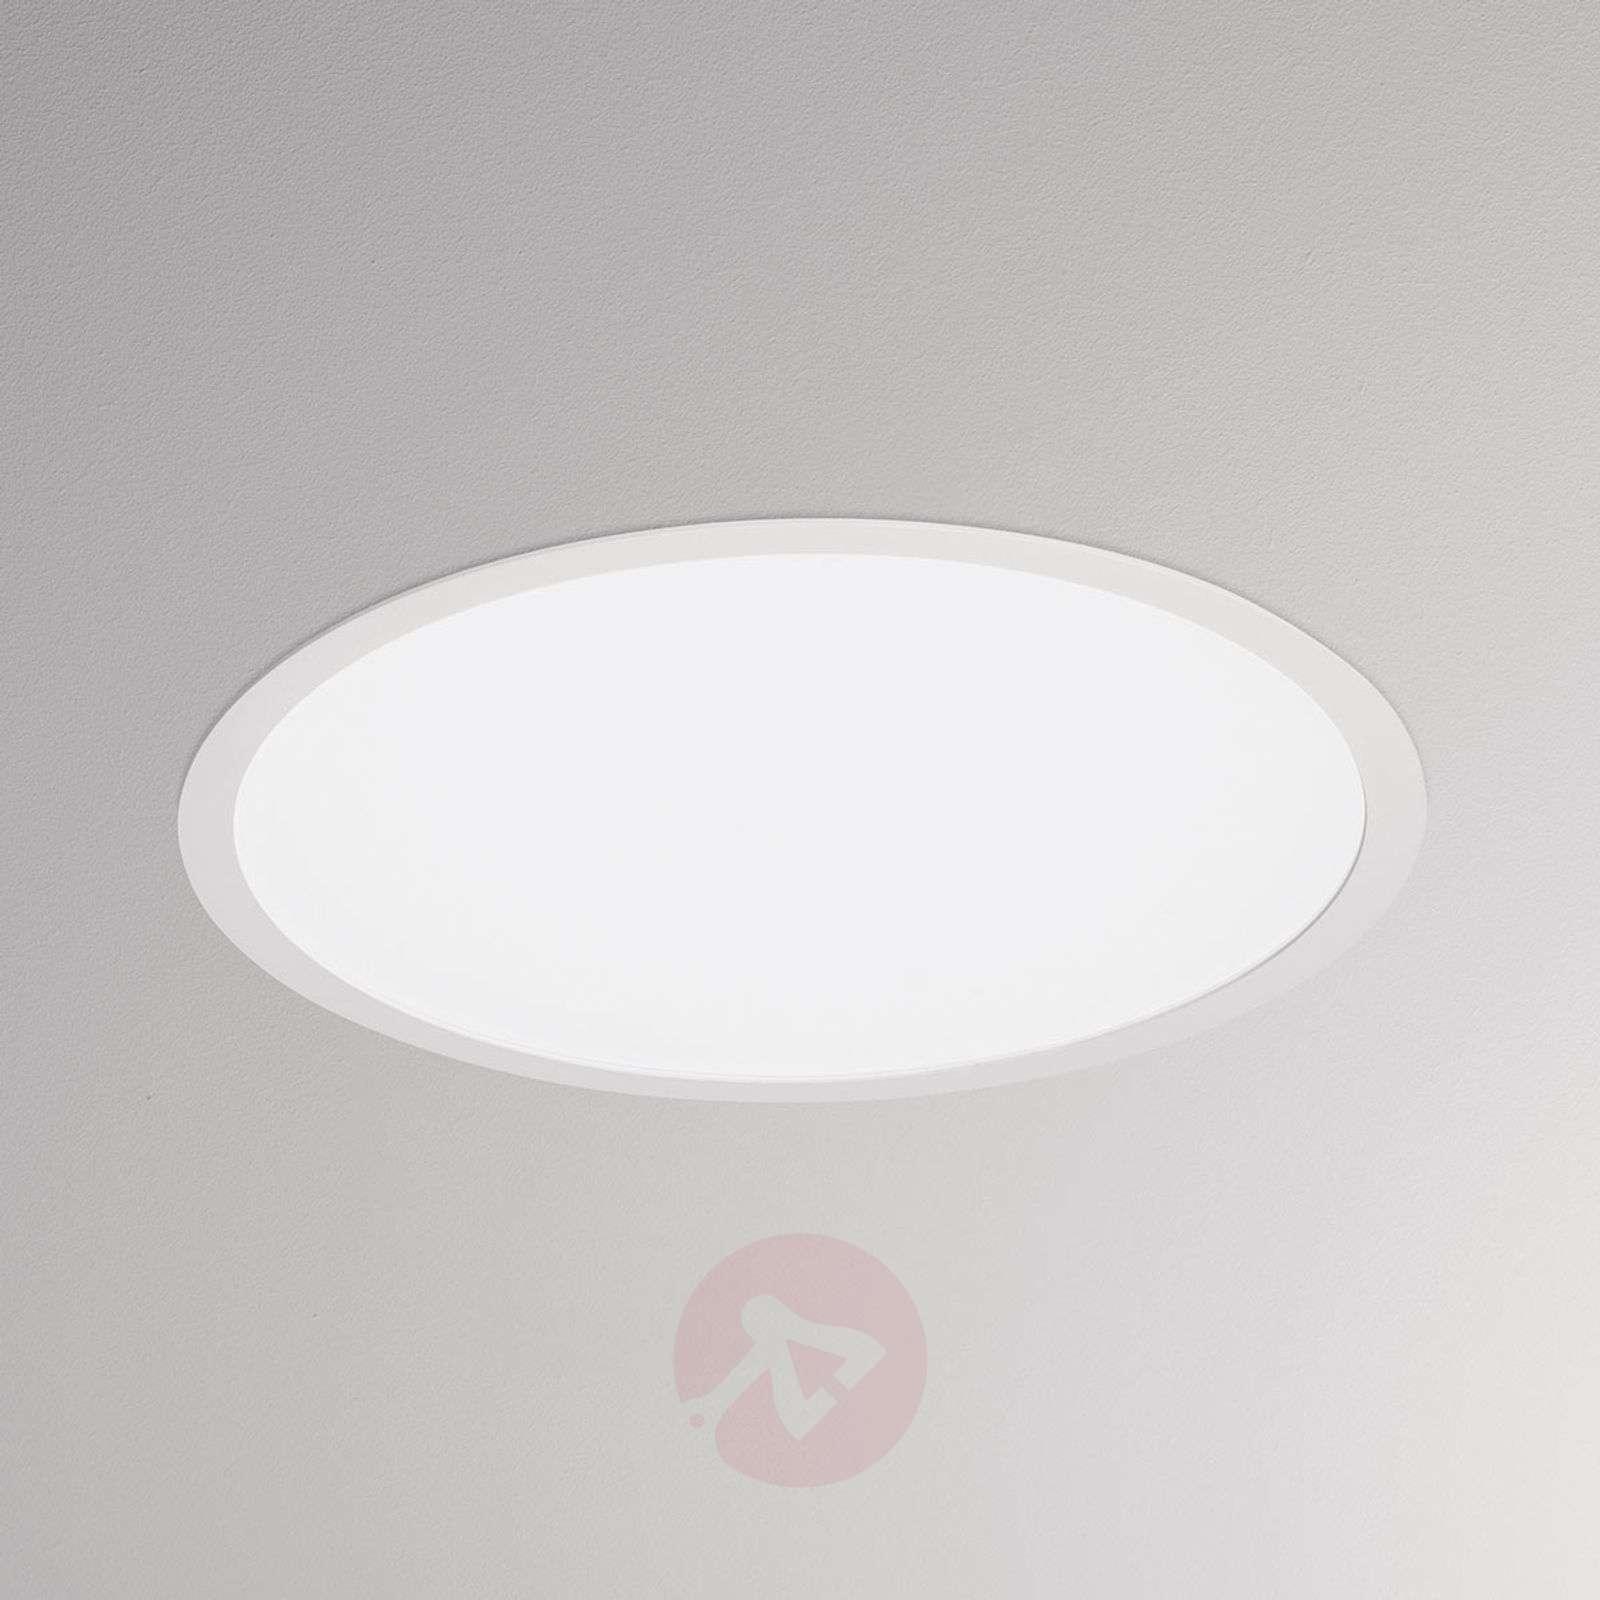 LED-uppovalaisin Bado R 32 cm, 16W-6523768X-01